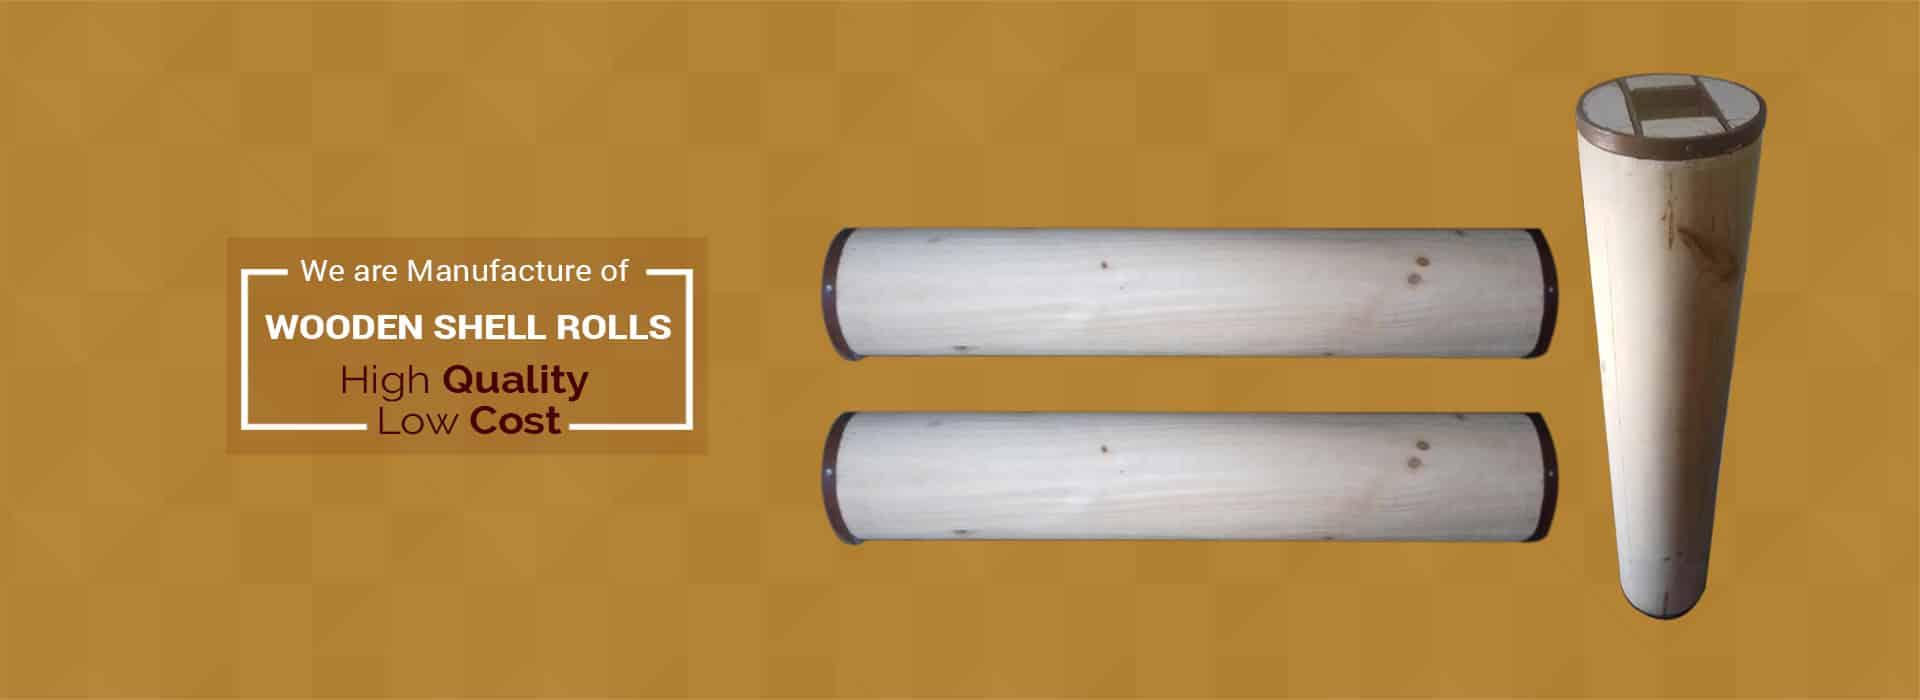 Wooden Shell Rolls, Industrial Wooden Pallets